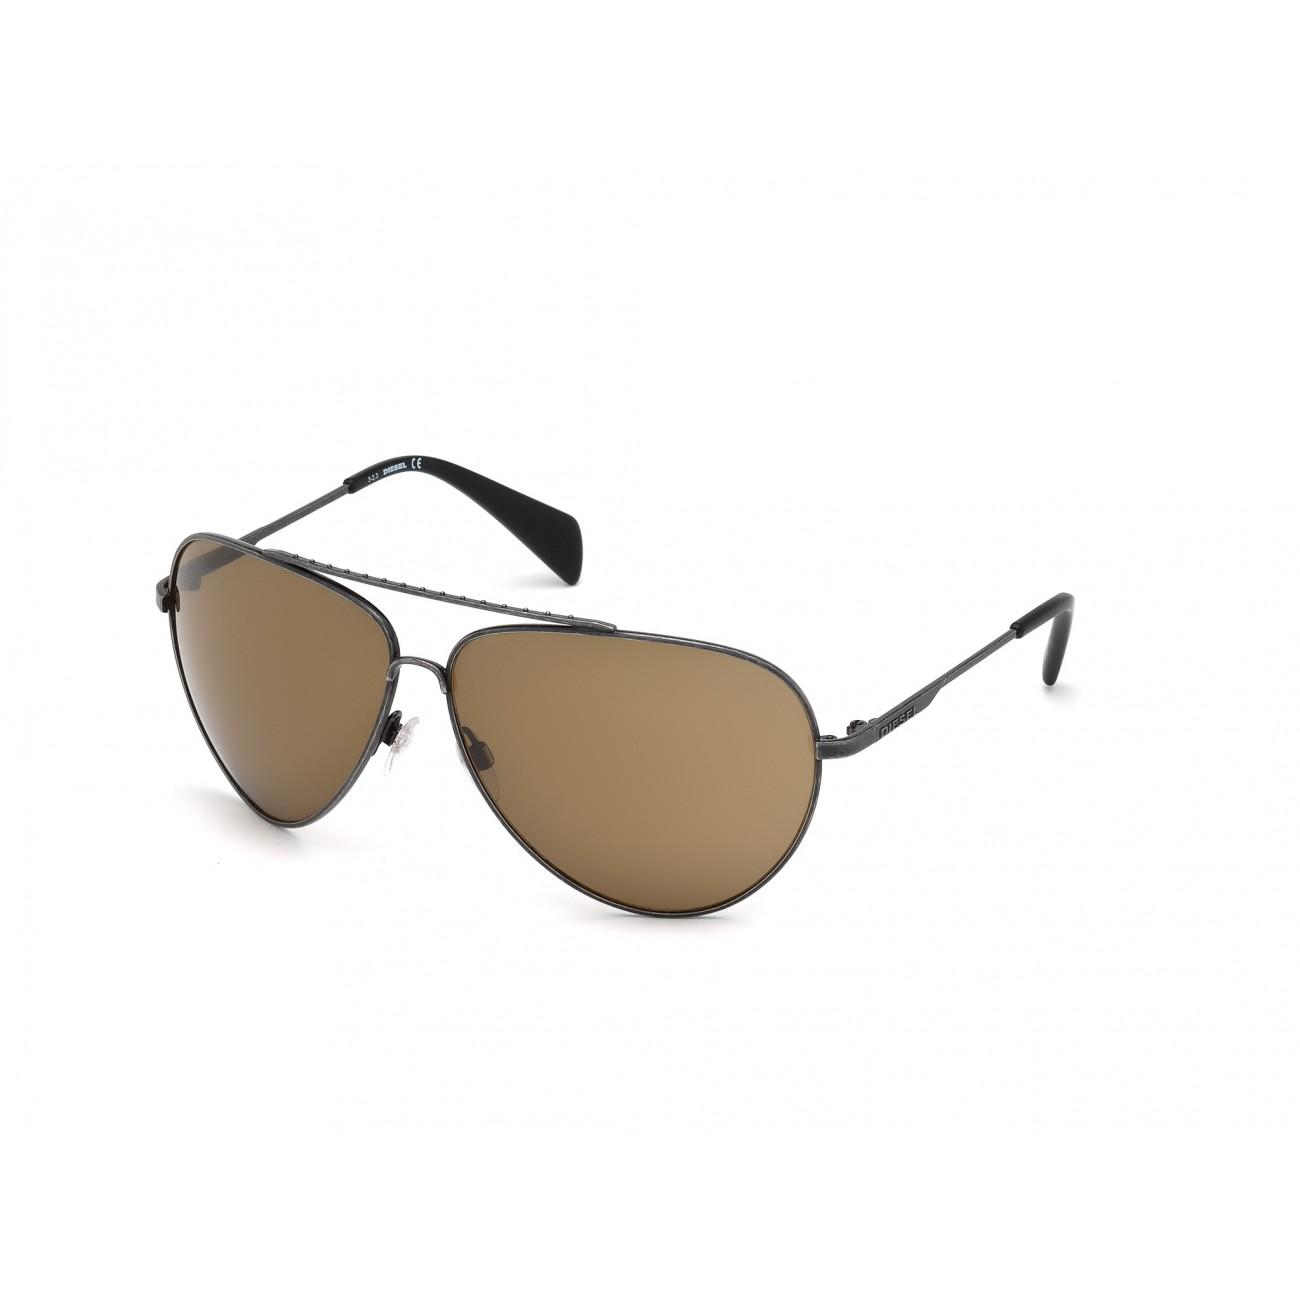 6ed694b28ac Man Sunglasses Ebay